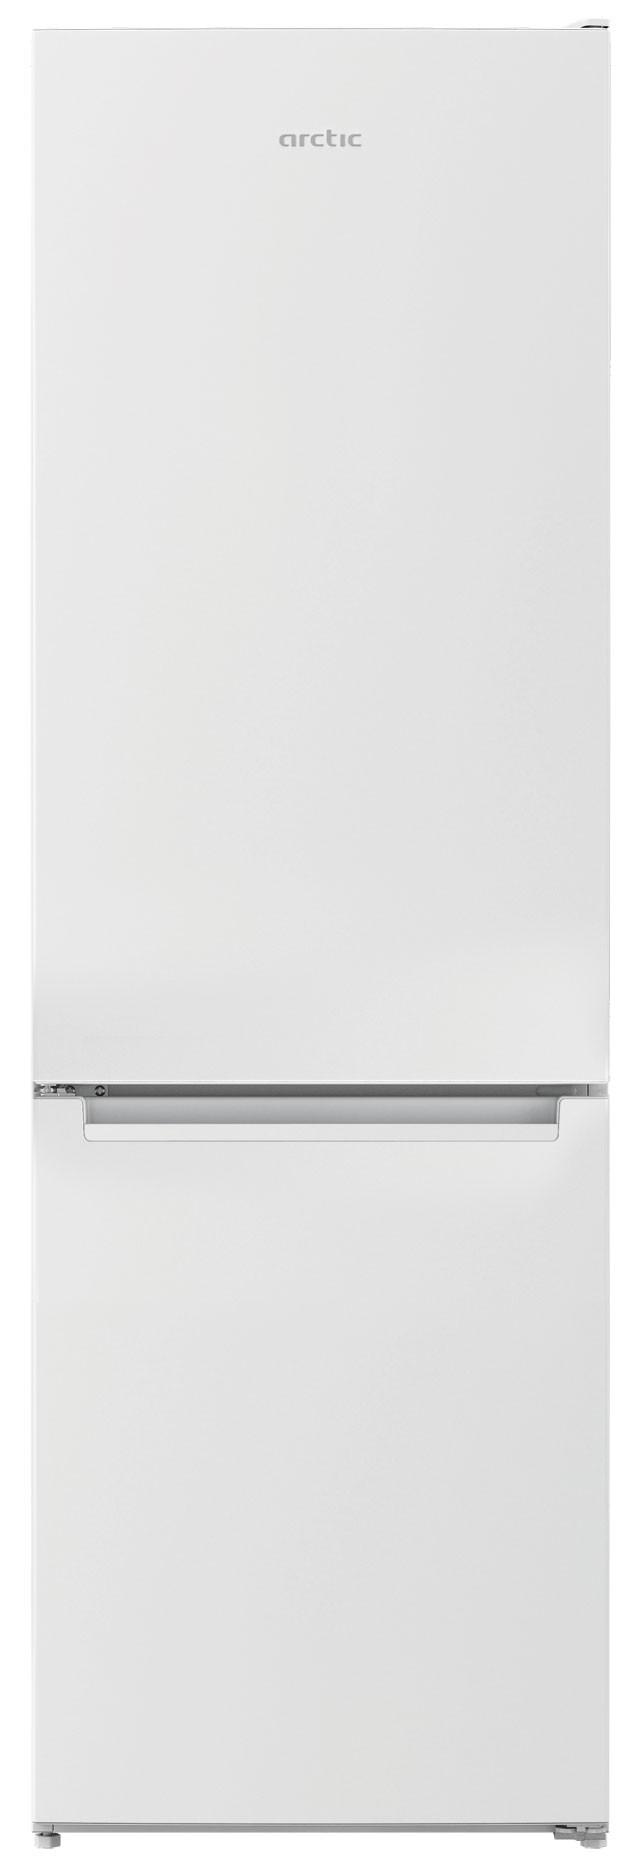 Combina frigorifica, Arctic, AK60406M40NFW, 362 l, Clasa E, H 202,5  cm, Alb